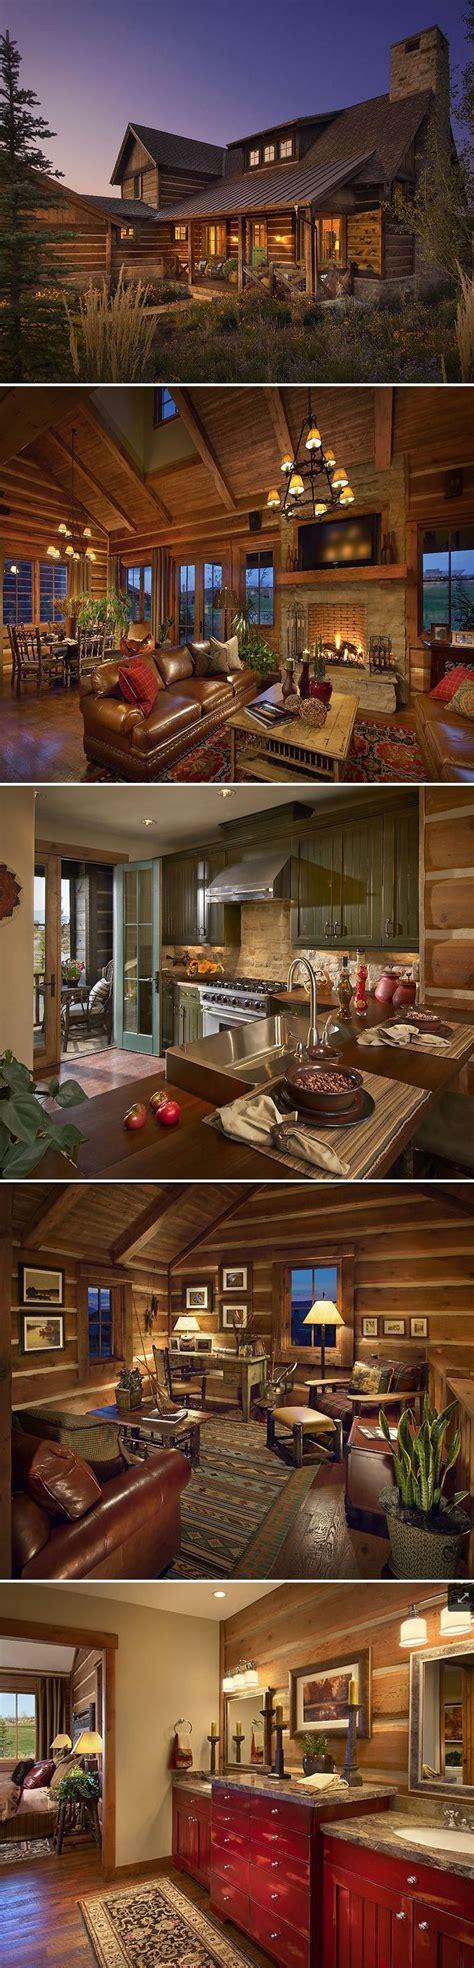 log home design ideas log homes log cabin homes log